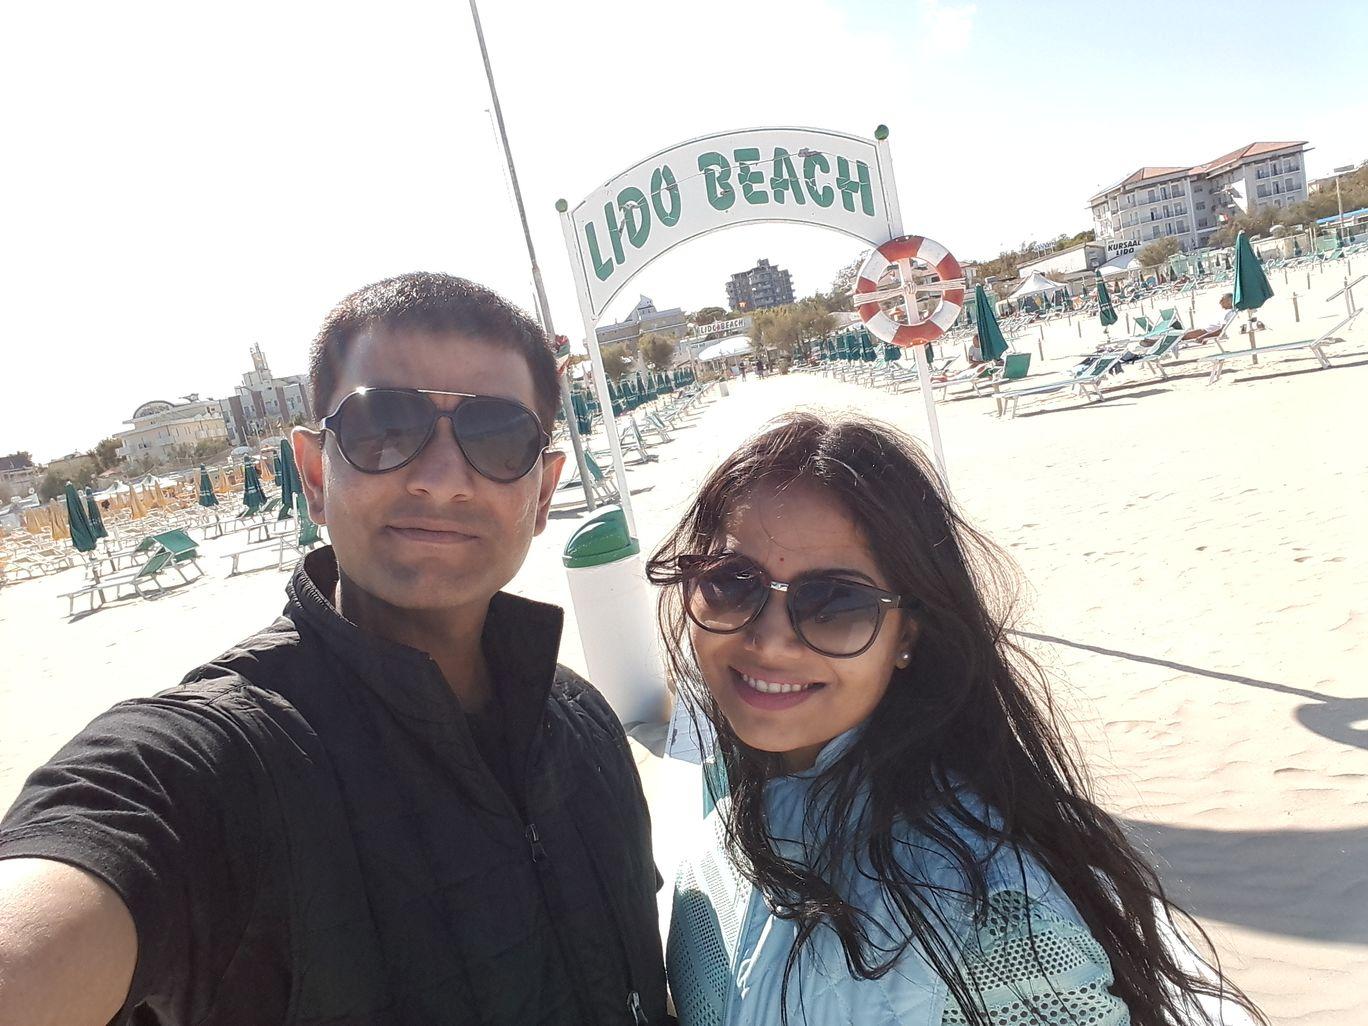 Photo of Lido Beach By Saurabh Basarkar